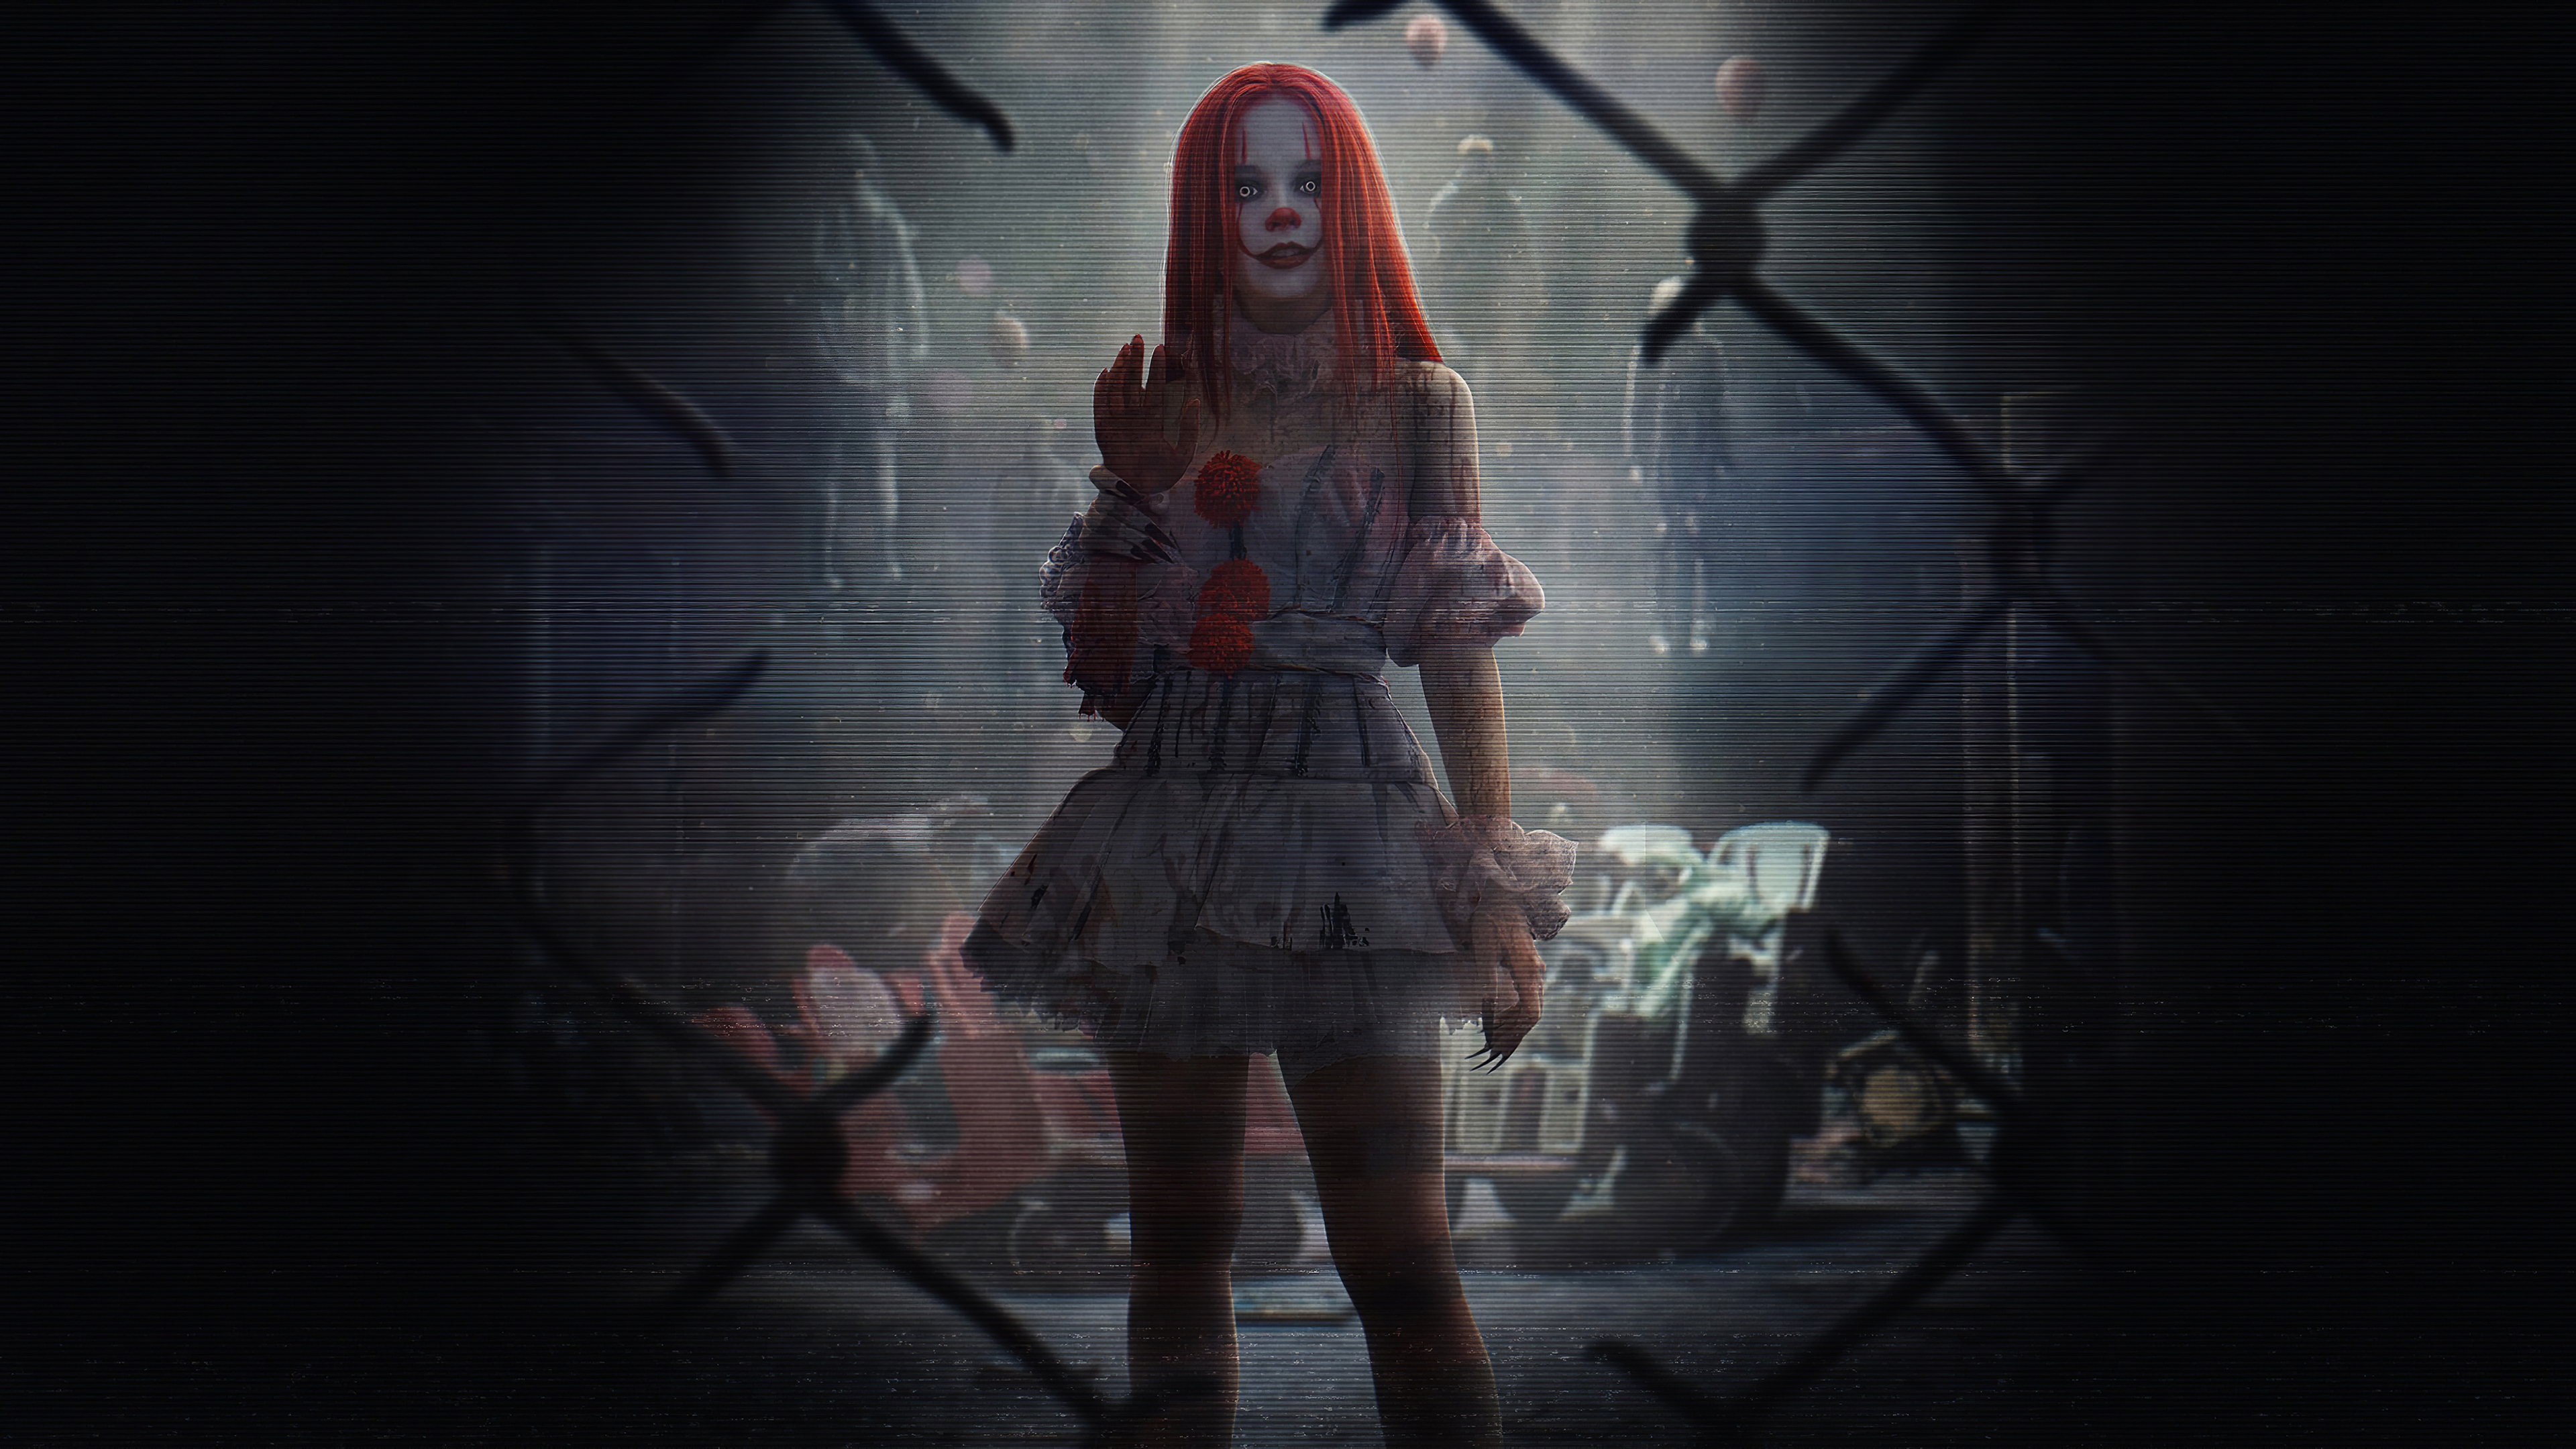 it clown girl 1572370985 - It Clown Girl - pennywise wallpapers, movies wallpapers, it wallpapers, hd-wallpapers, clown wallpapers, 4k-wallpapers